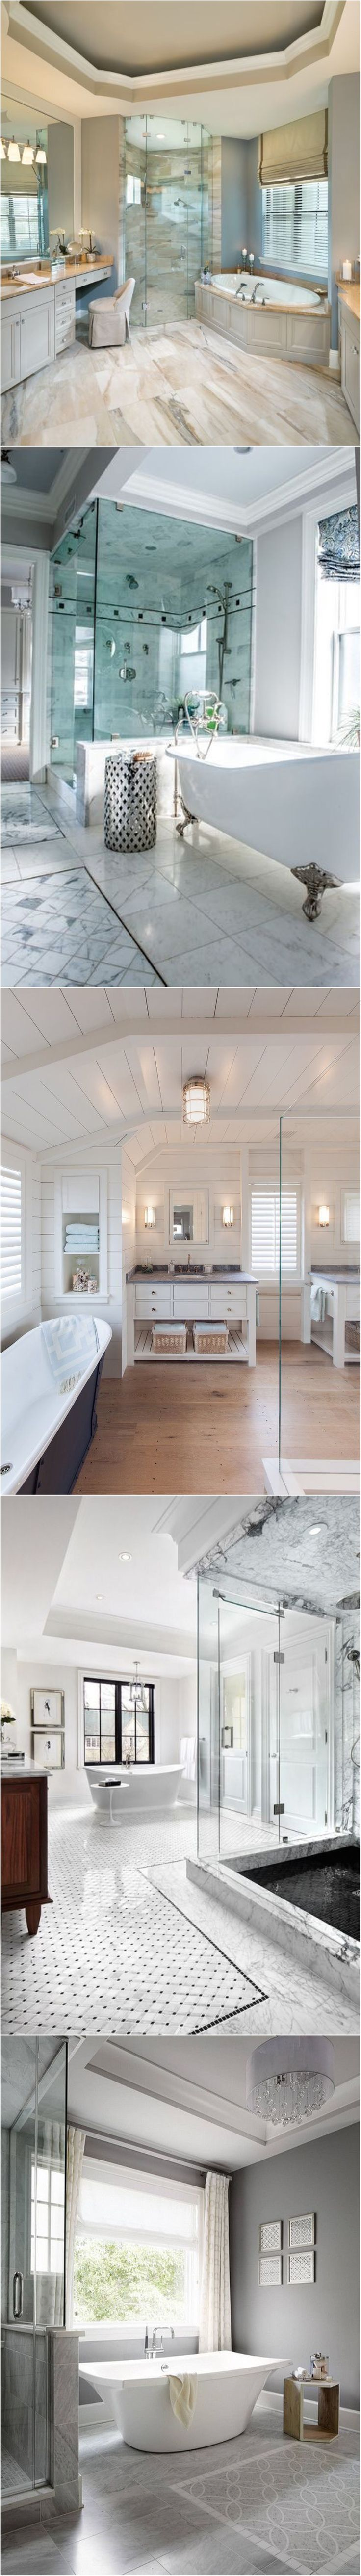 Best 10 Bathroom ideas ideas on Pinterest